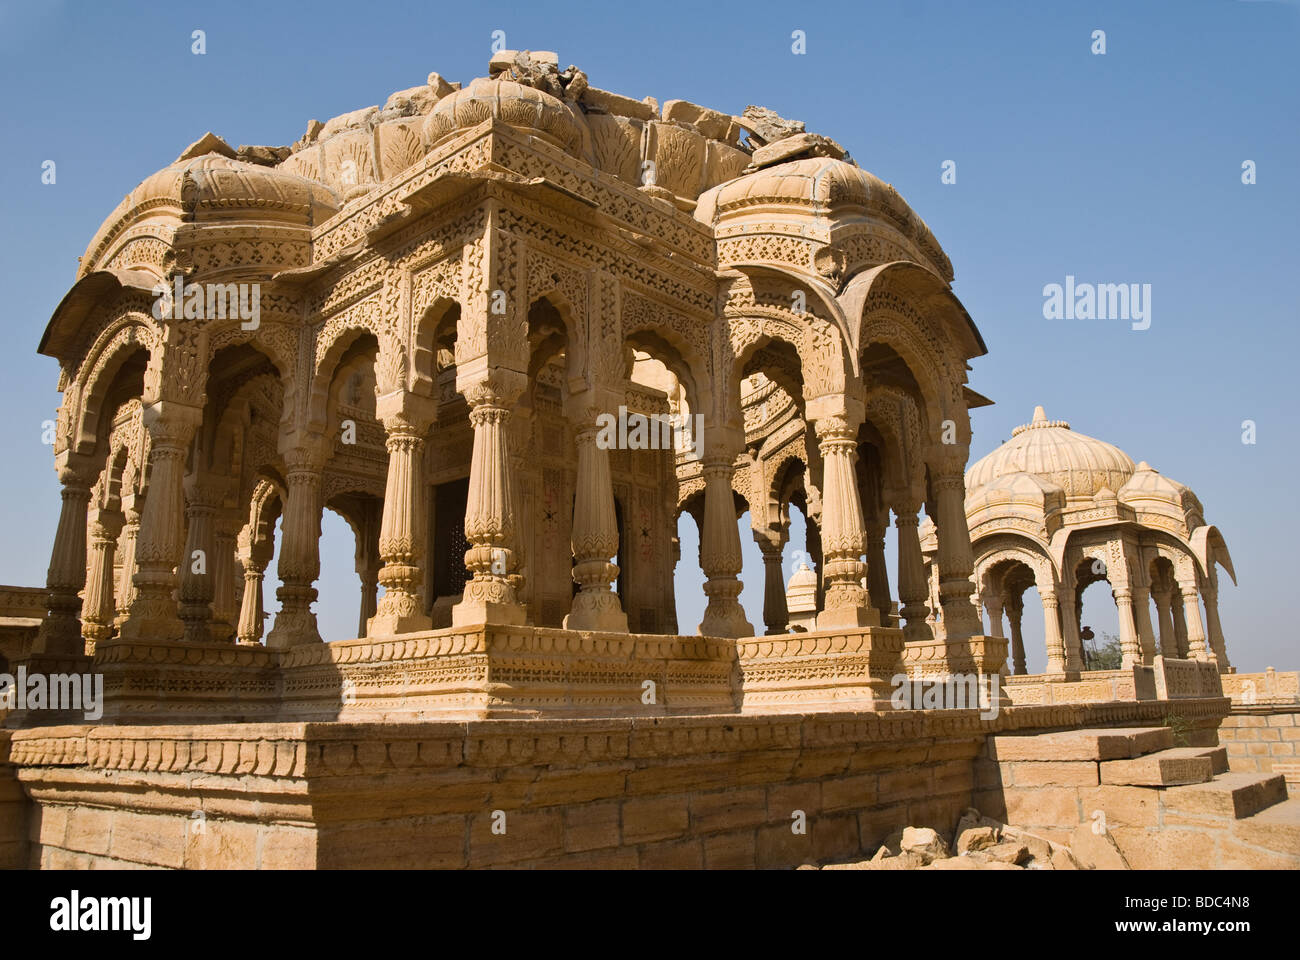 A cenotaph at Bada Bagh, Jaisalmer, Rajasthan, India Stock Photo